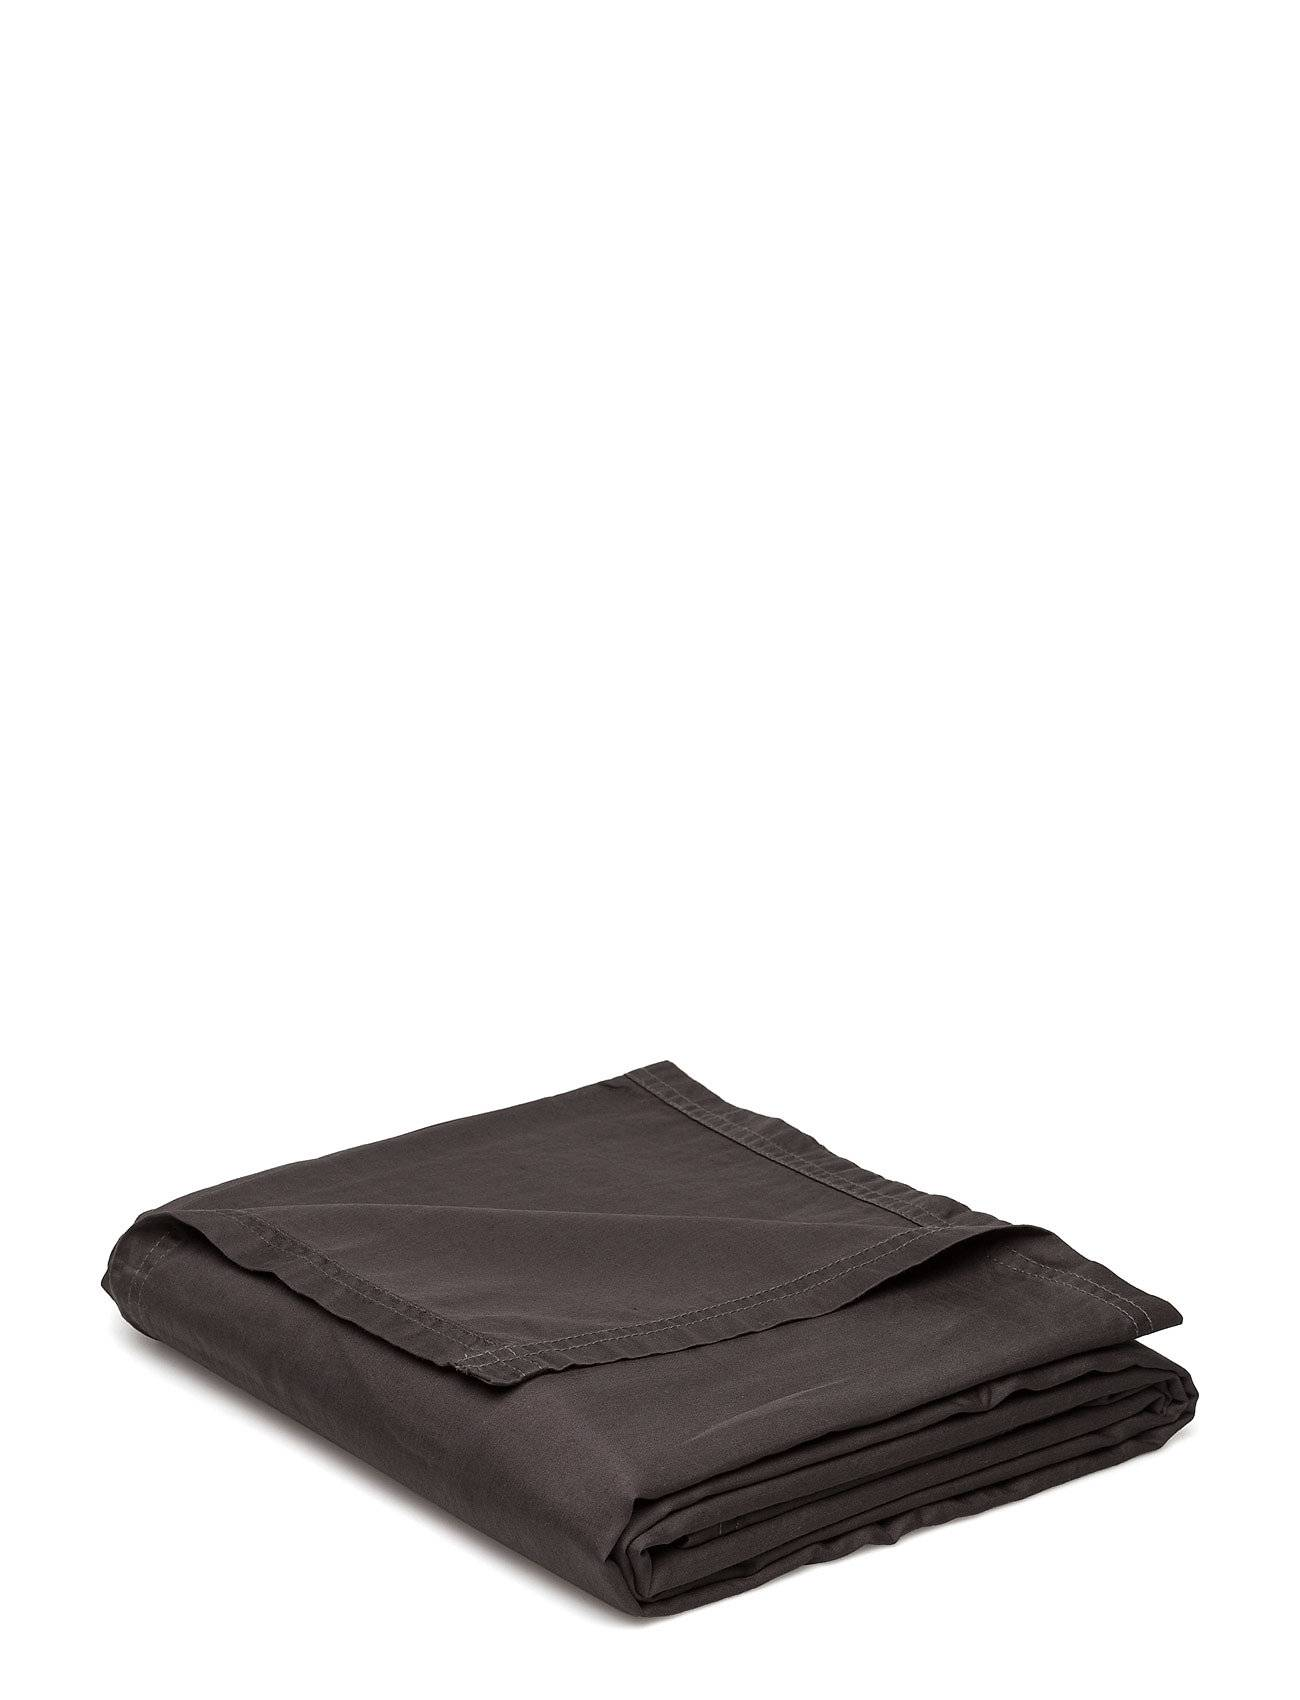 Himla Soul Of Himla Sheet Home Bedroom Sheets Musta Himla